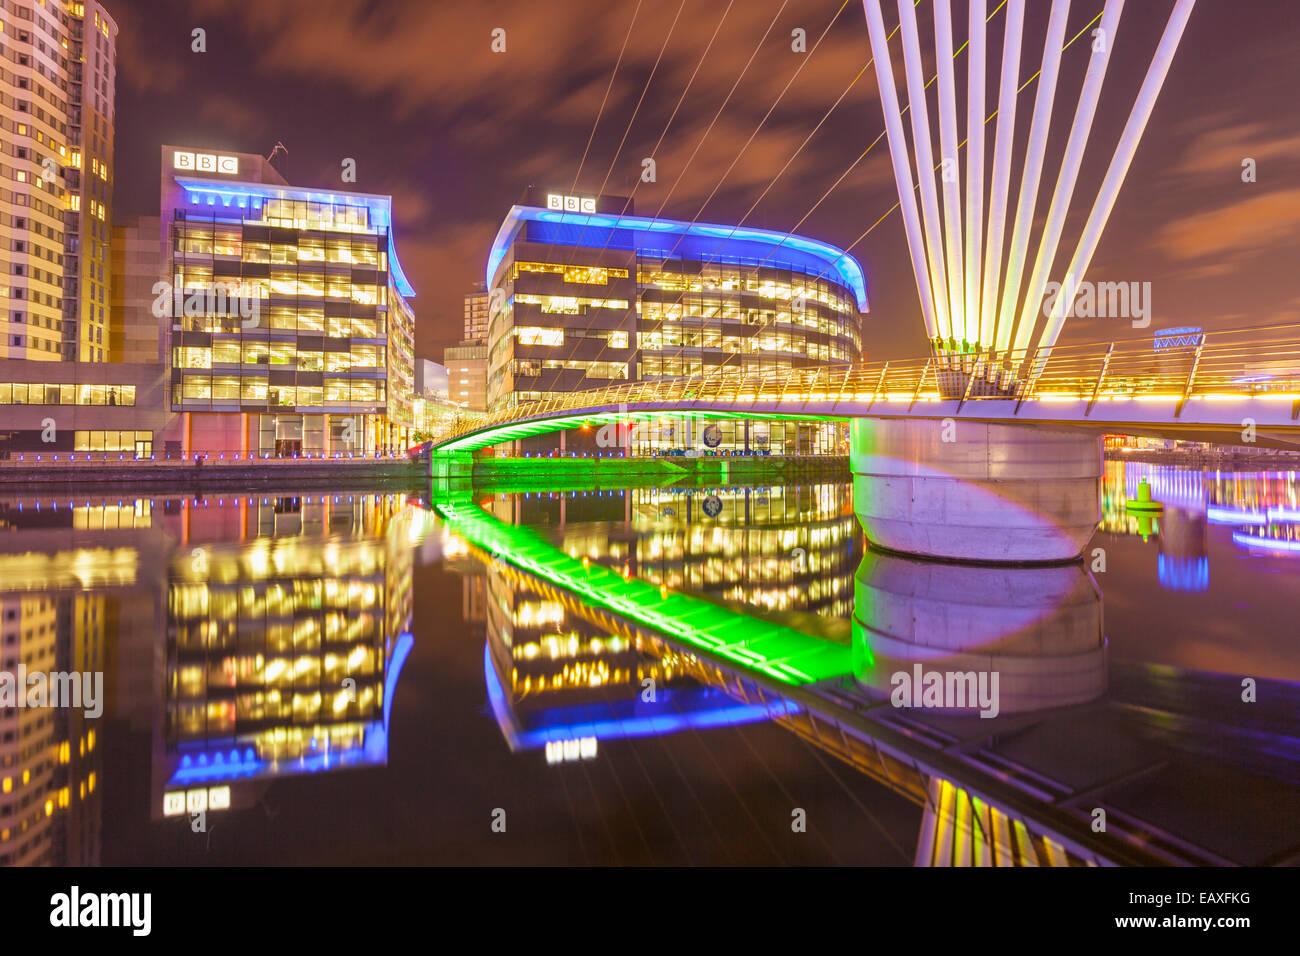 Media City UK Salford Quays manchester skyline Greater Manchester England UK GB EU Europe - Stock Image